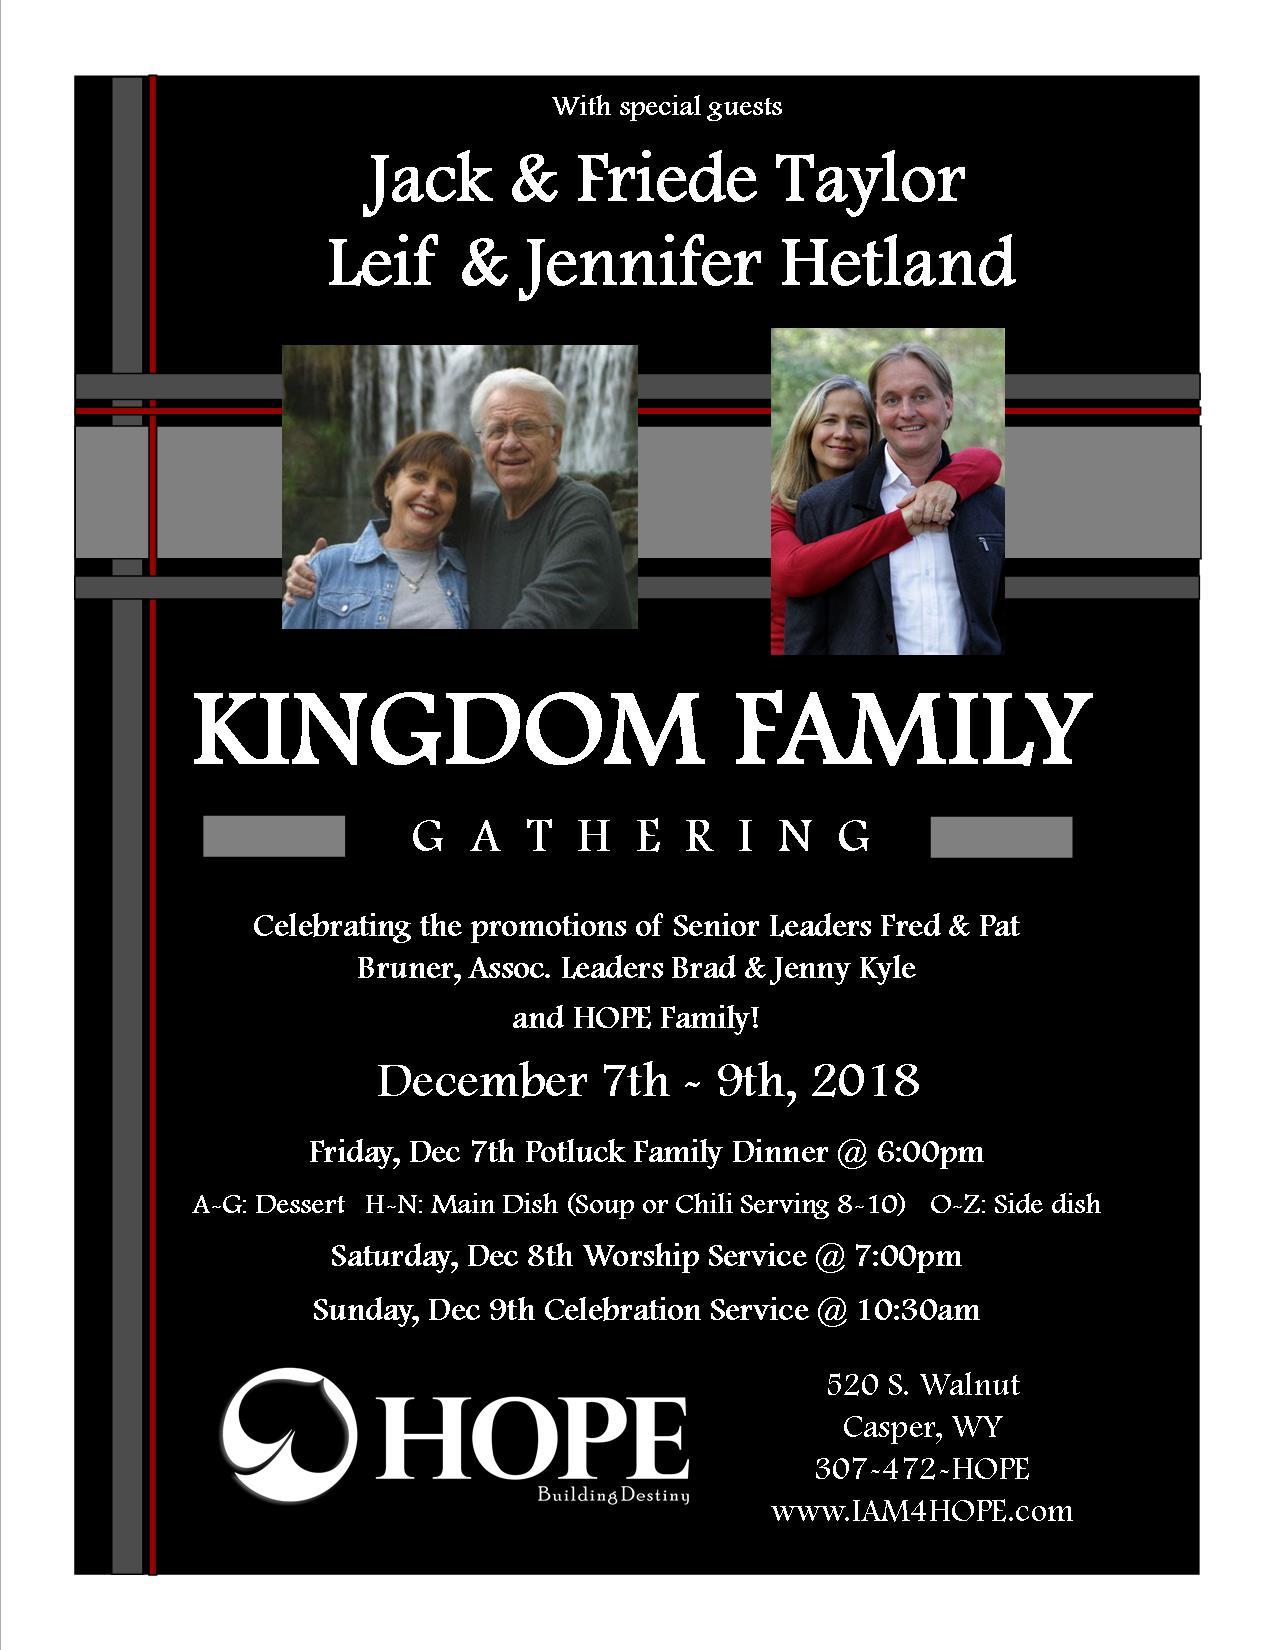 Kingdom Family Gathering Poster.jpg